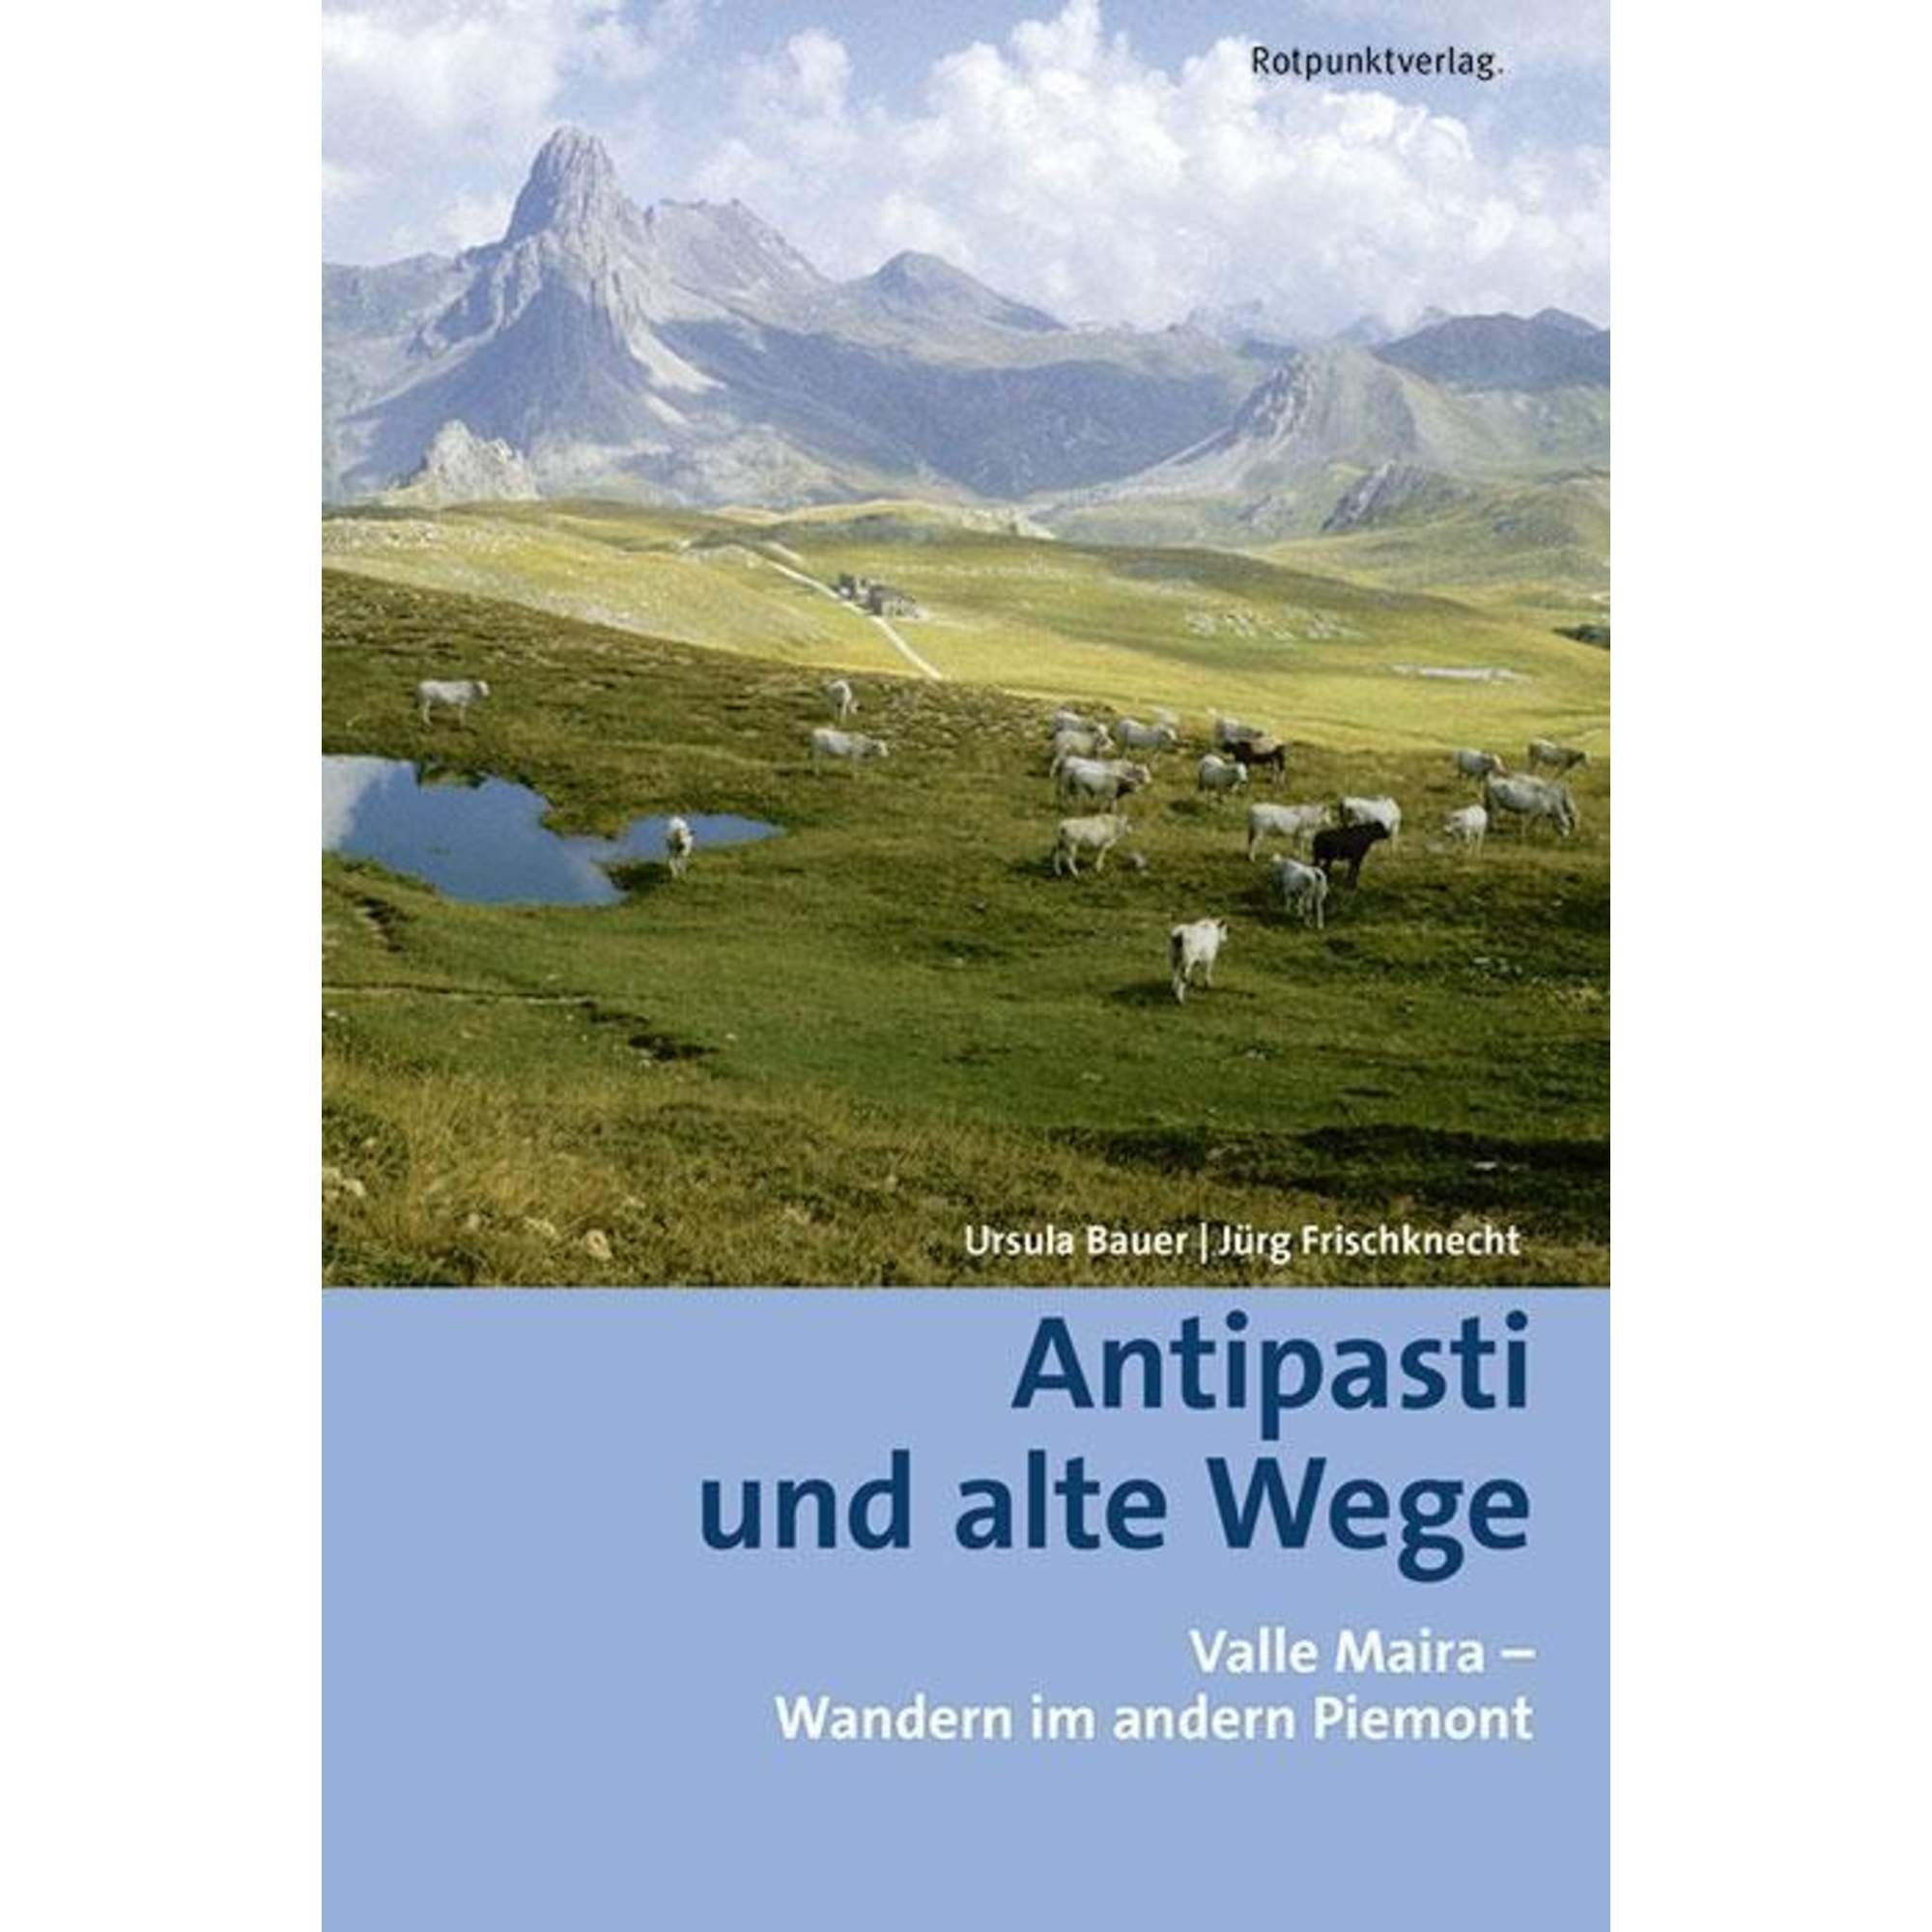 Antipasti und alte Wege, 29,00 Euro